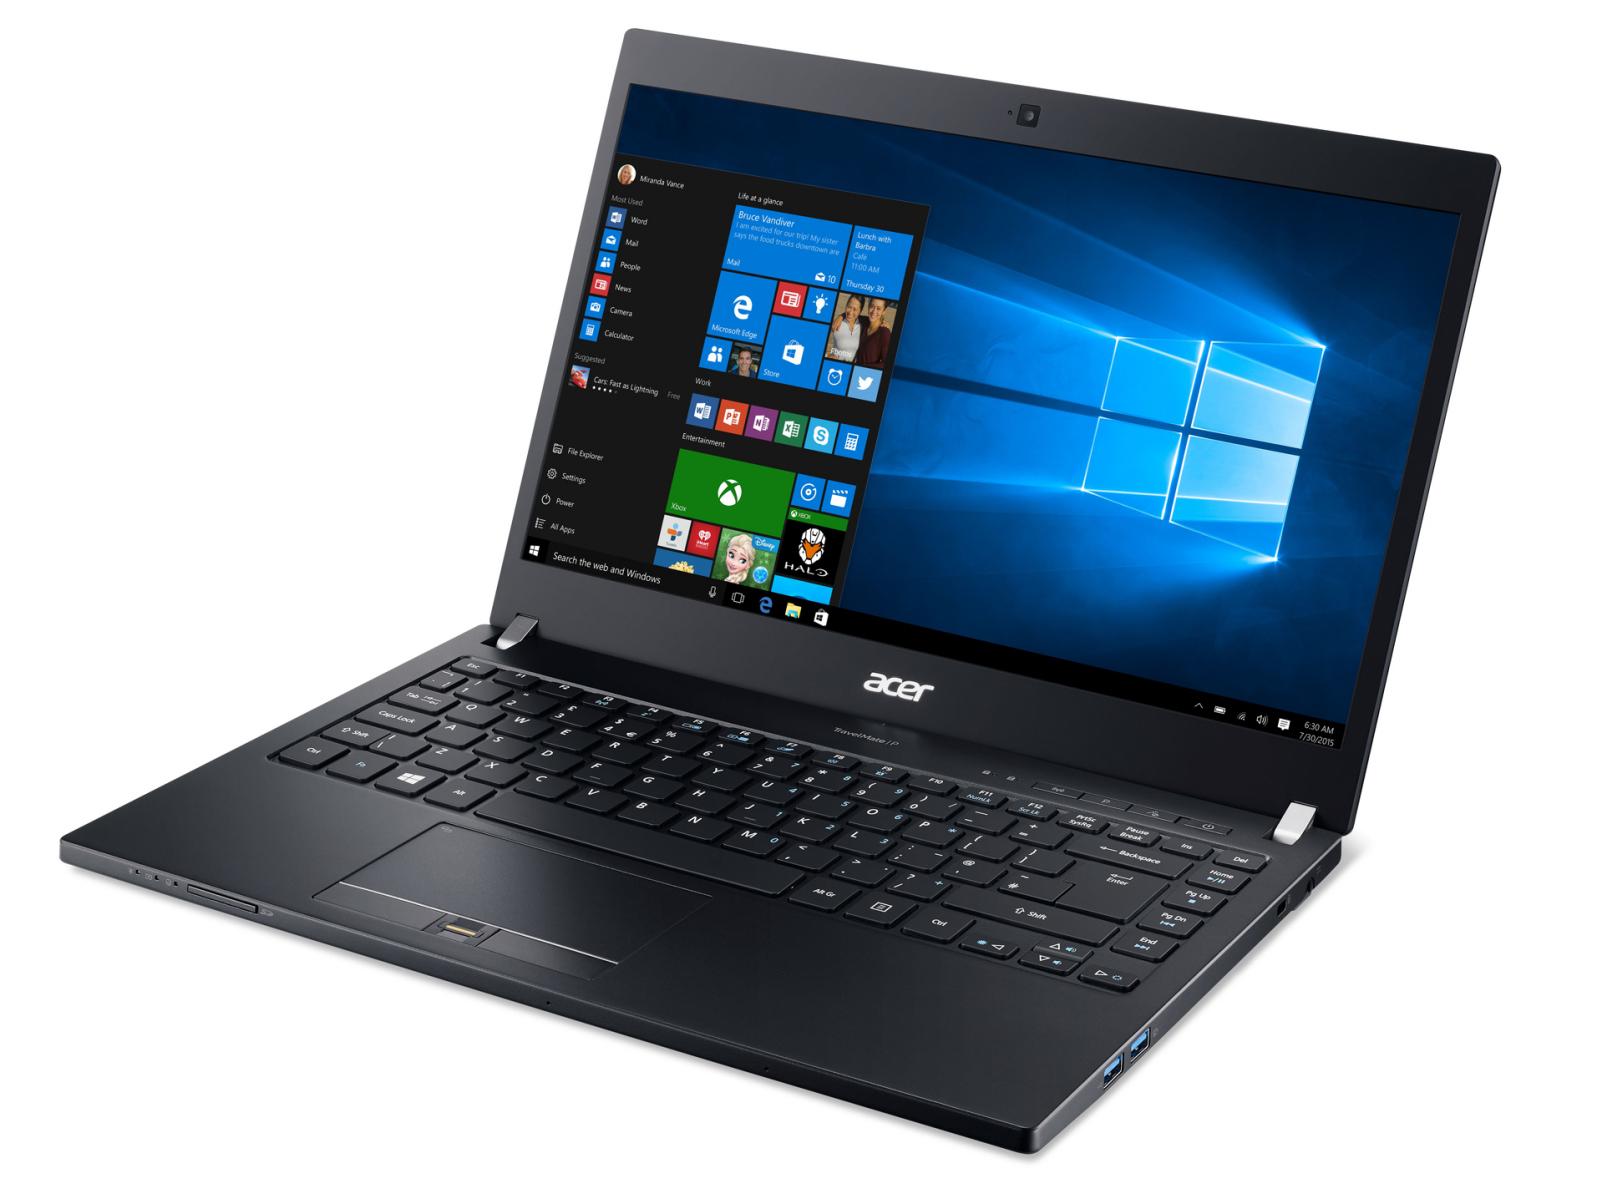 Acer TravelMate P653-MG Intel USB 3.0 Windows 8 X64 Driver Download